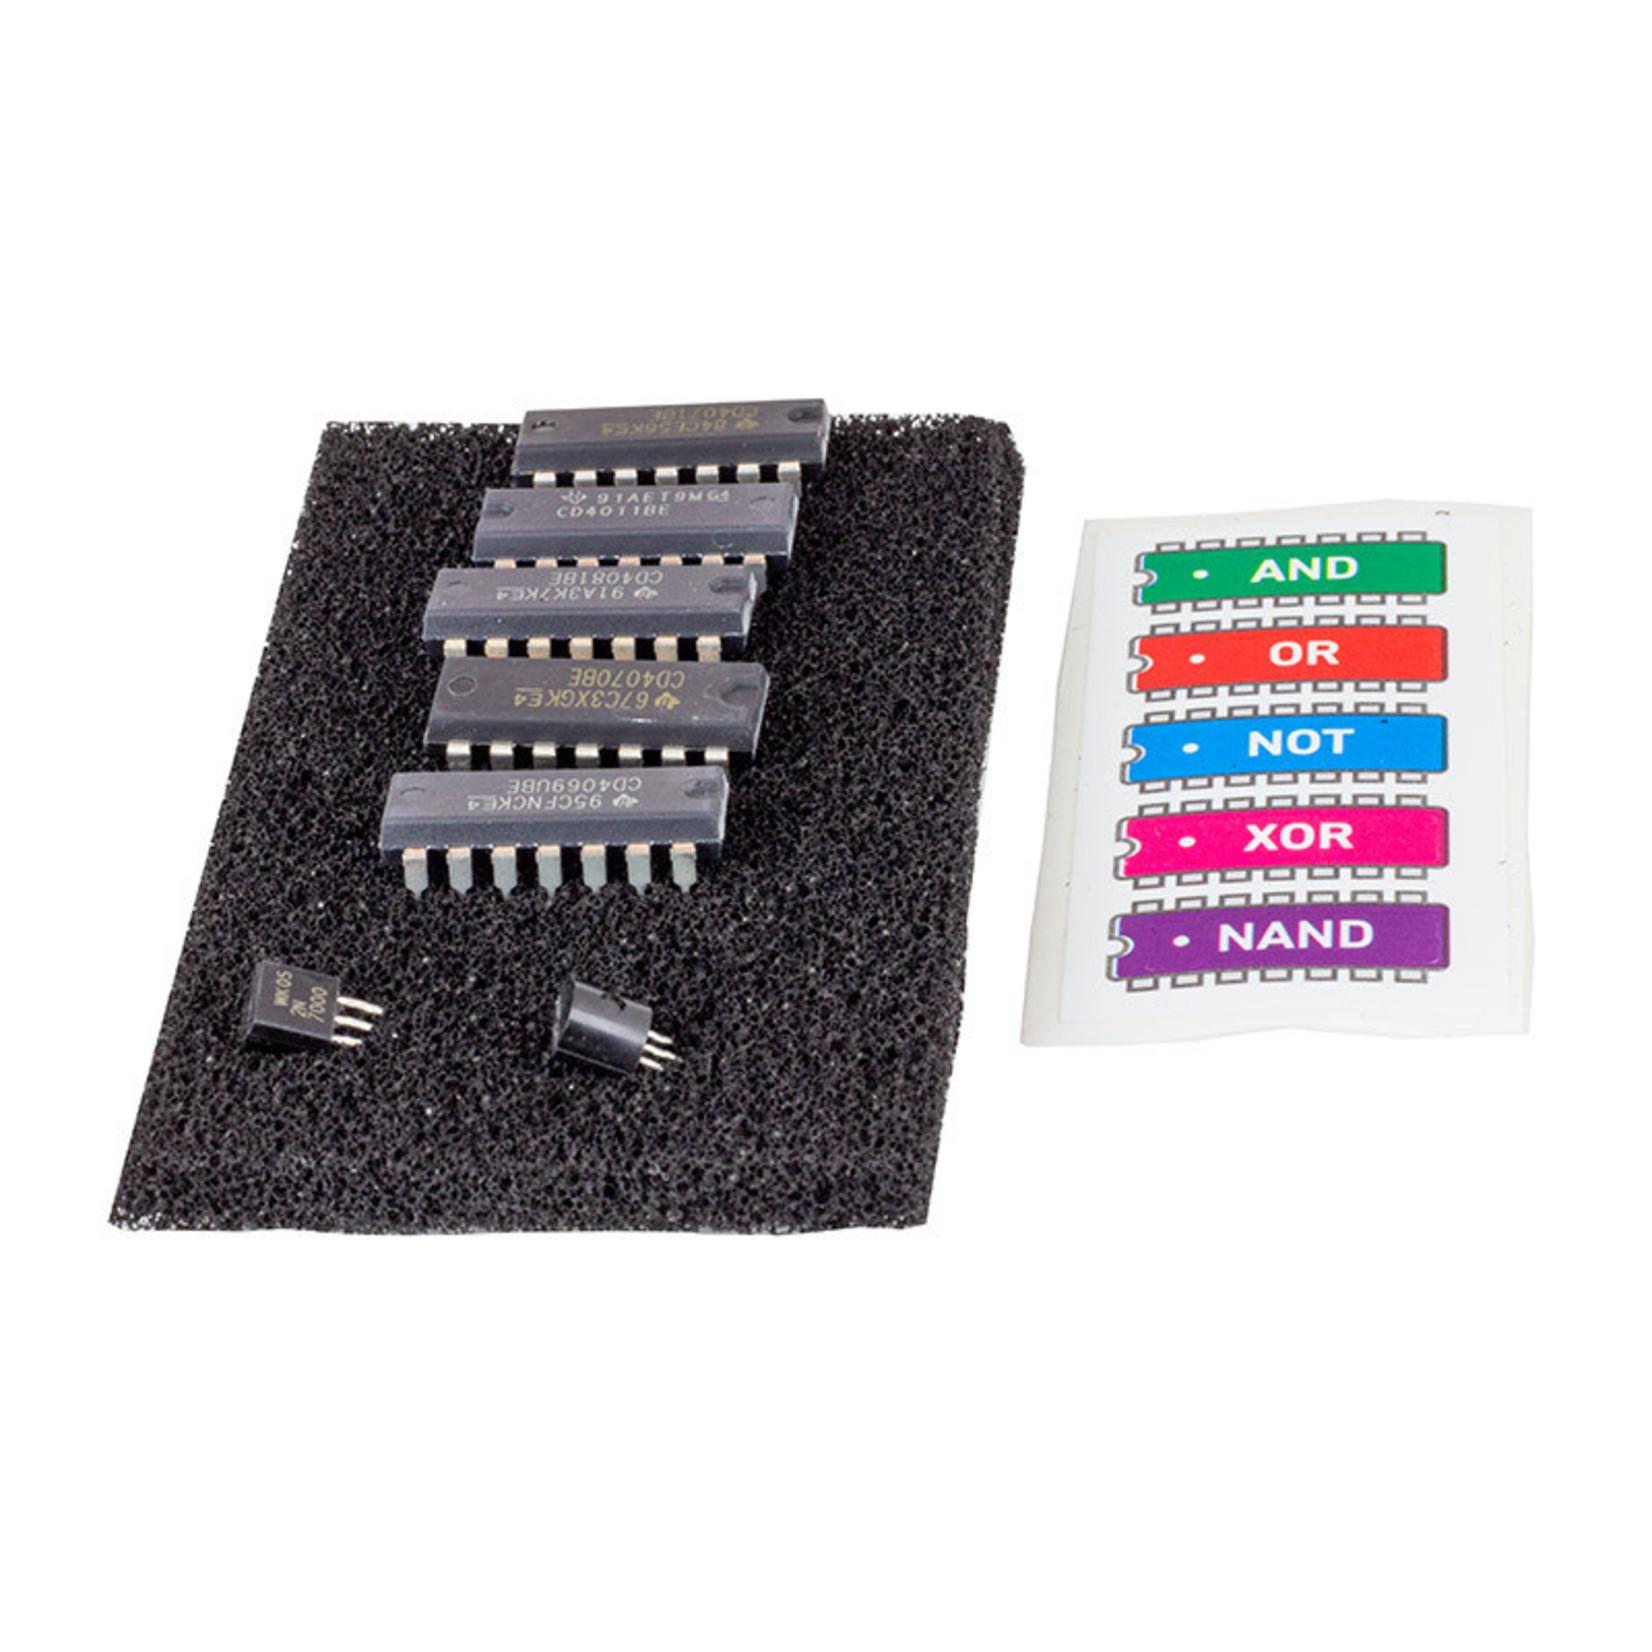 Kitronik Digital Logic Pack for Kitronik Inventor's Kit